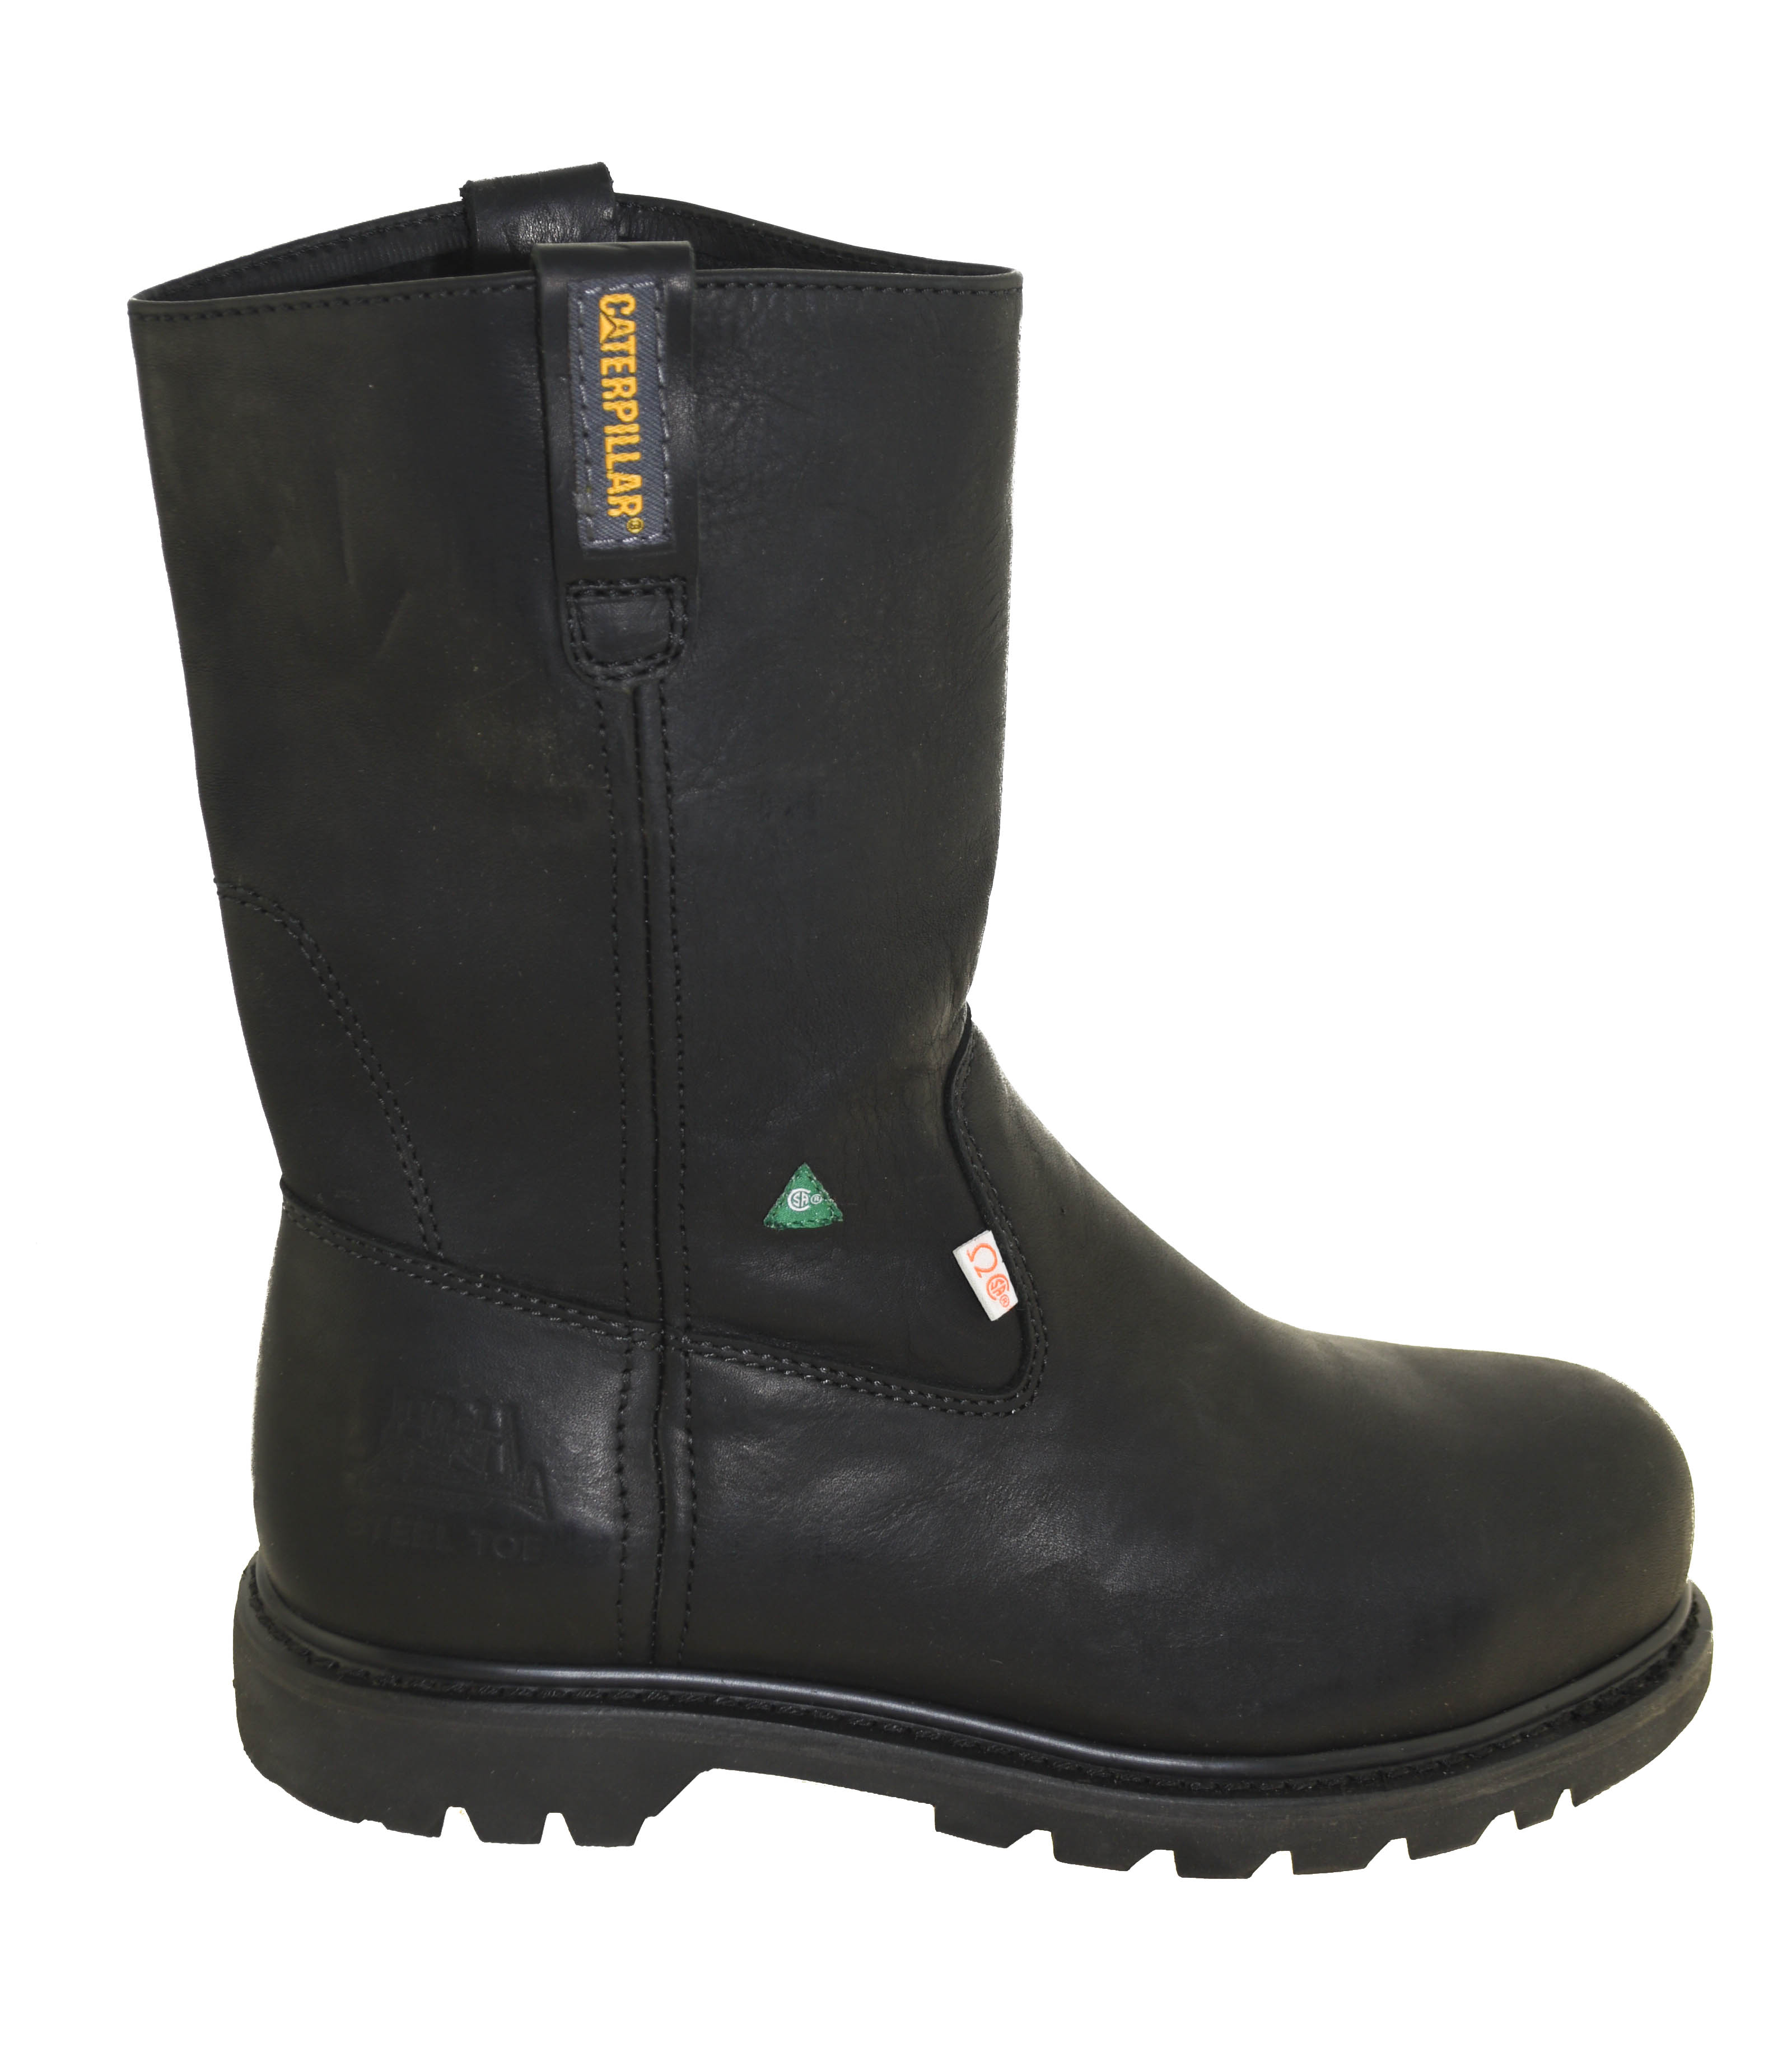 caterpillar s steel toe pull on work boots black ebay